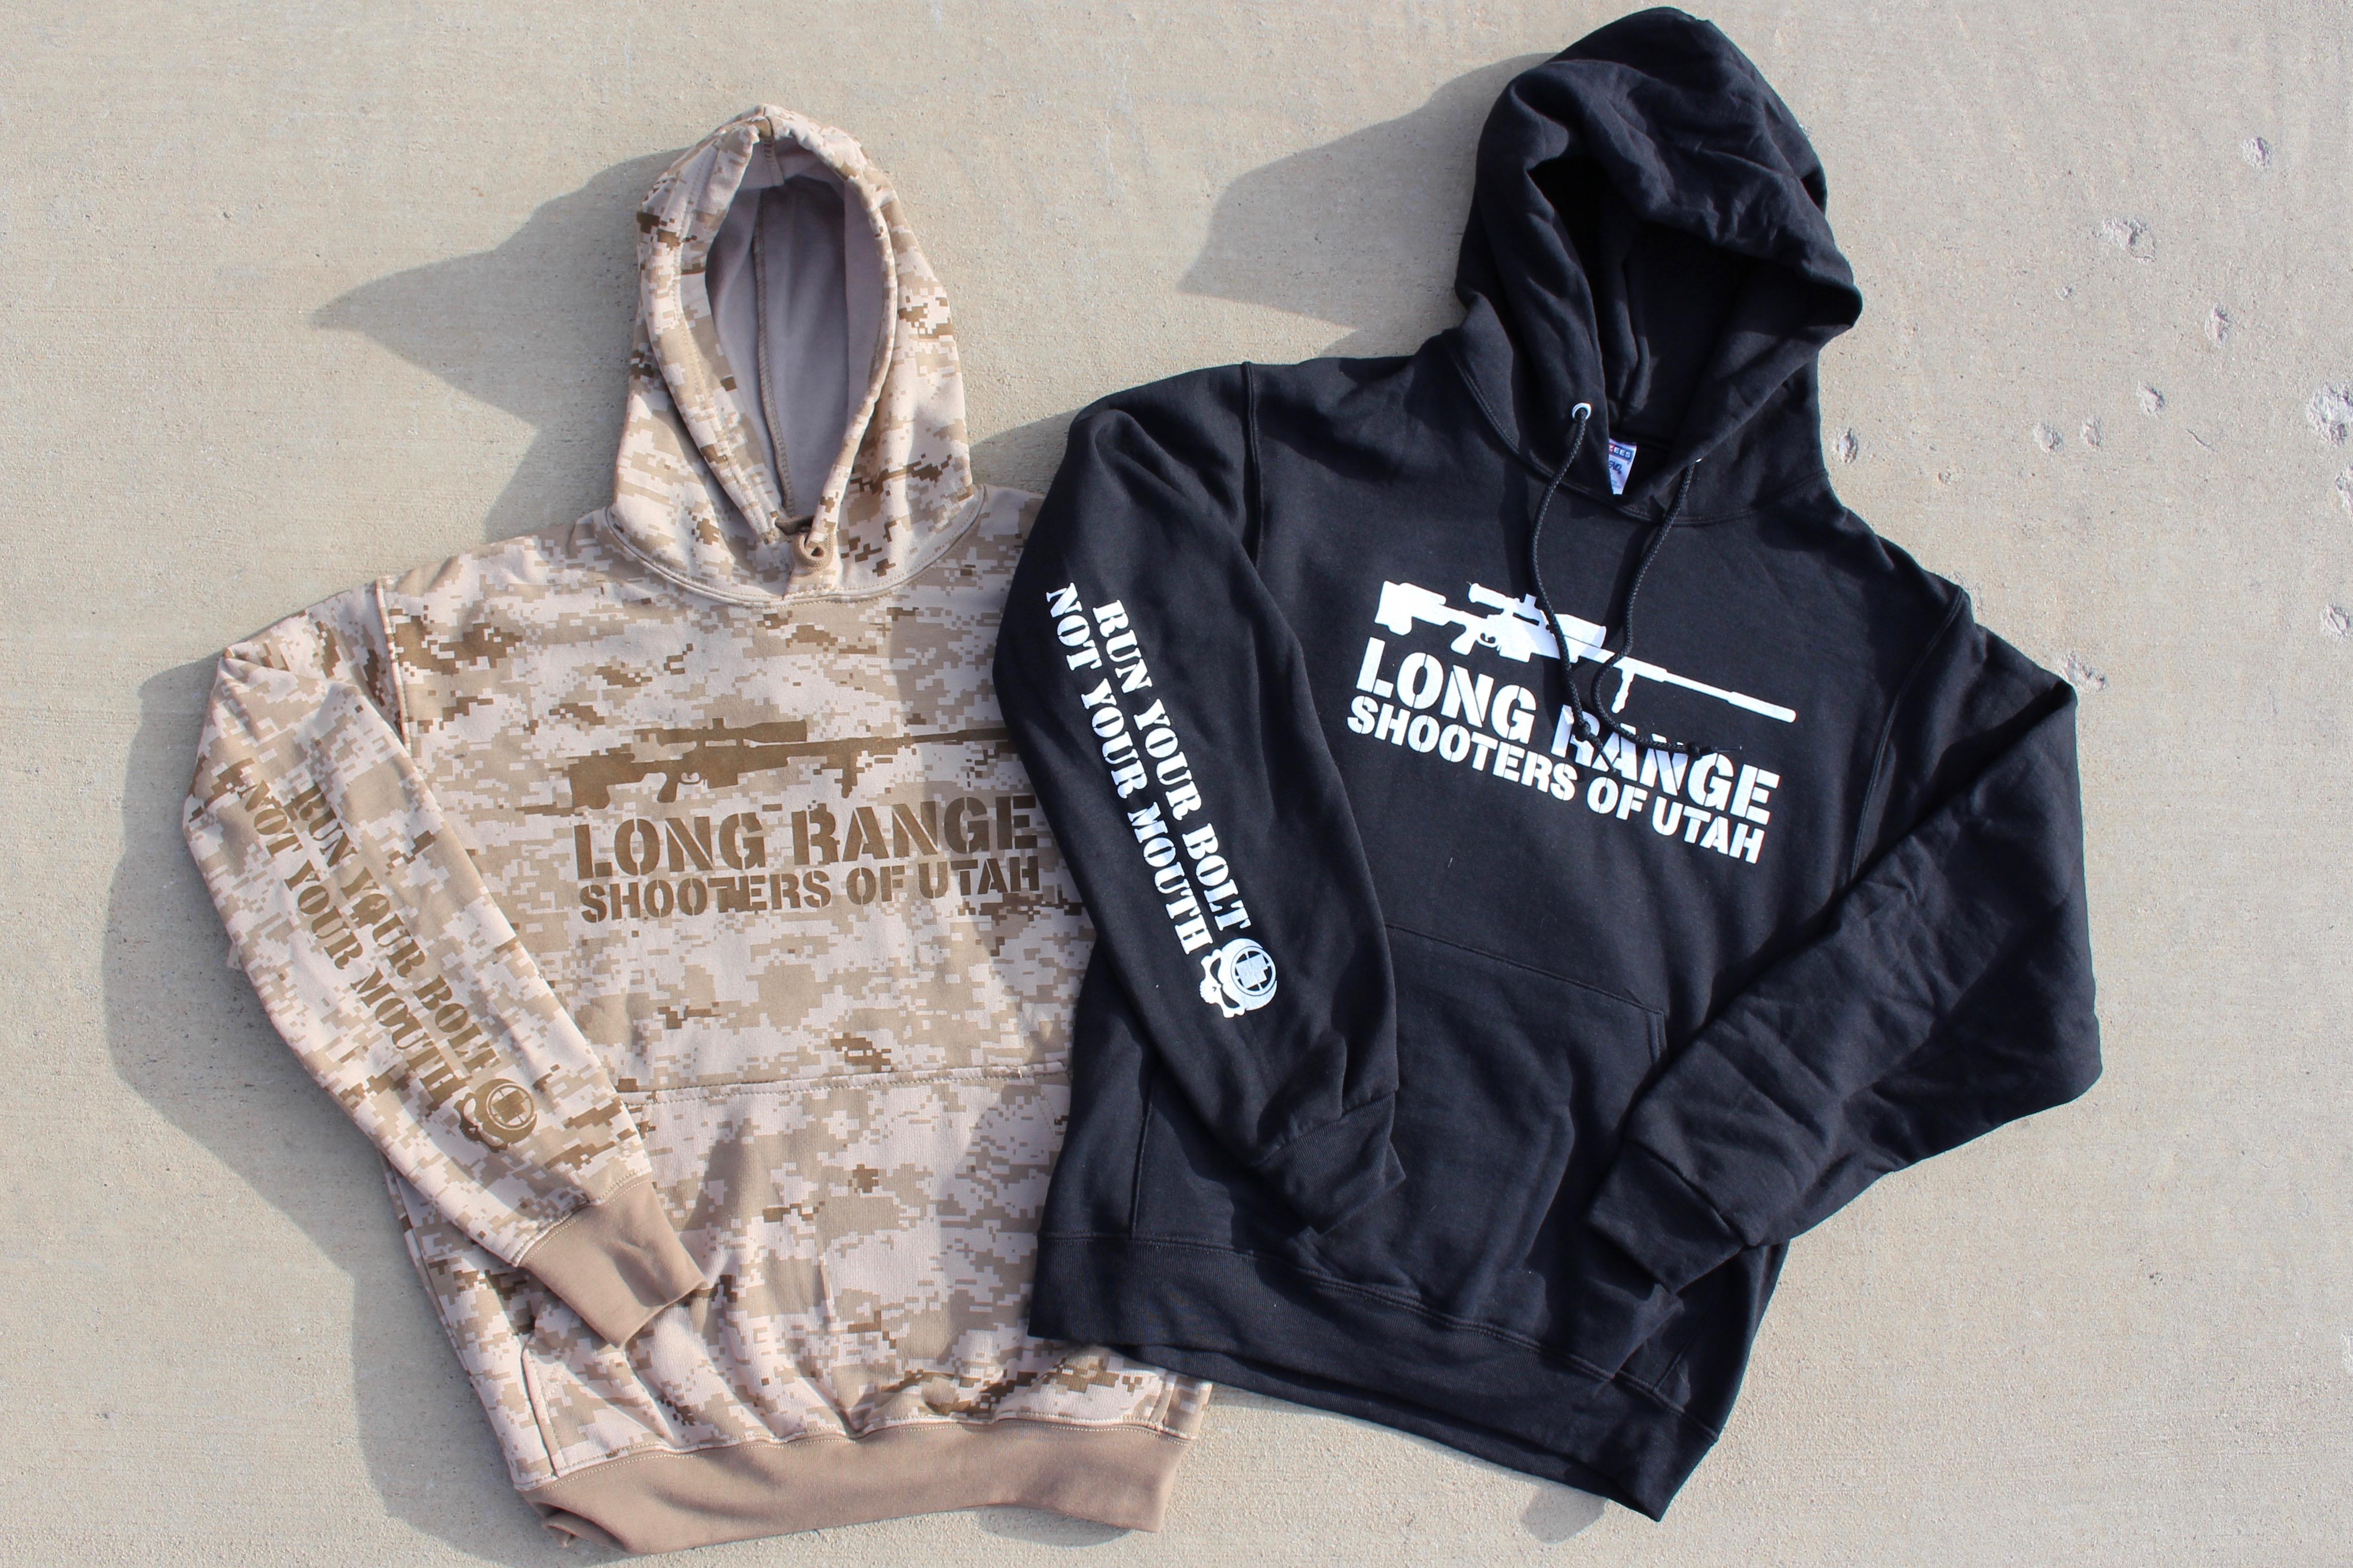 ff631b1d8a588 LRSU Rifle Logo Hoodie - Long Range Shooters Of Utah